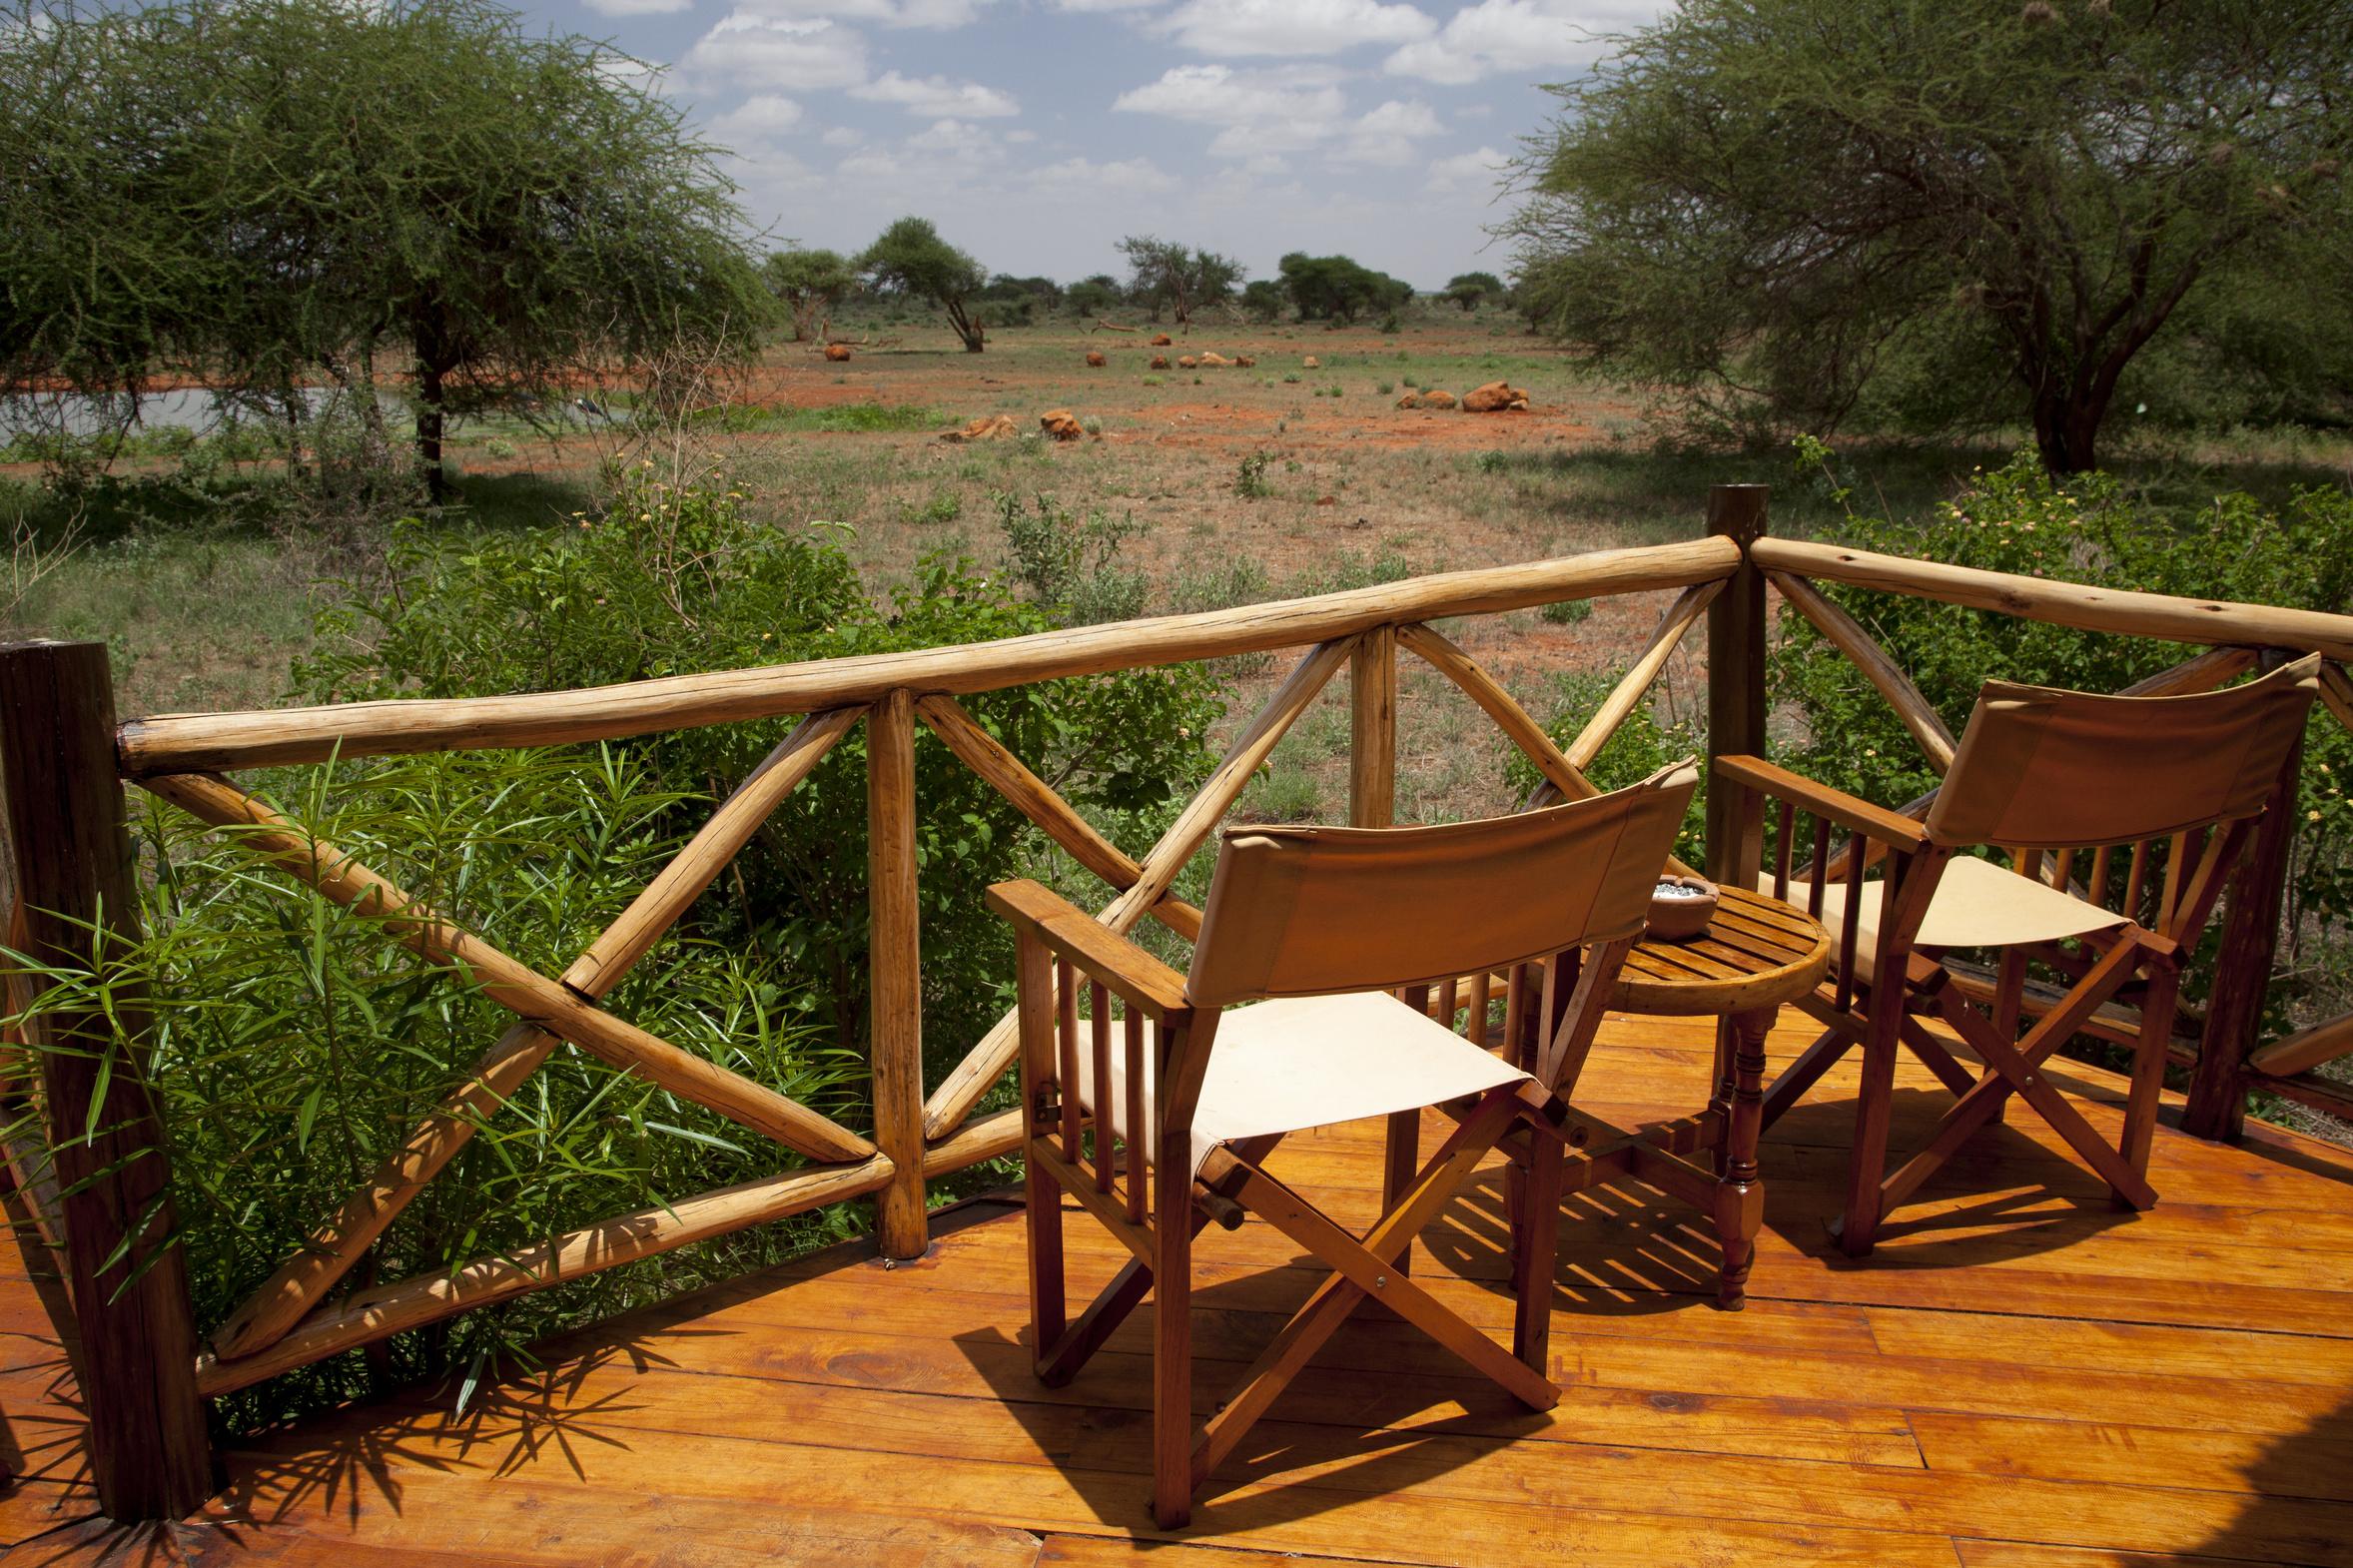 Kenia Africa _  Photo  Herby Meseritsch